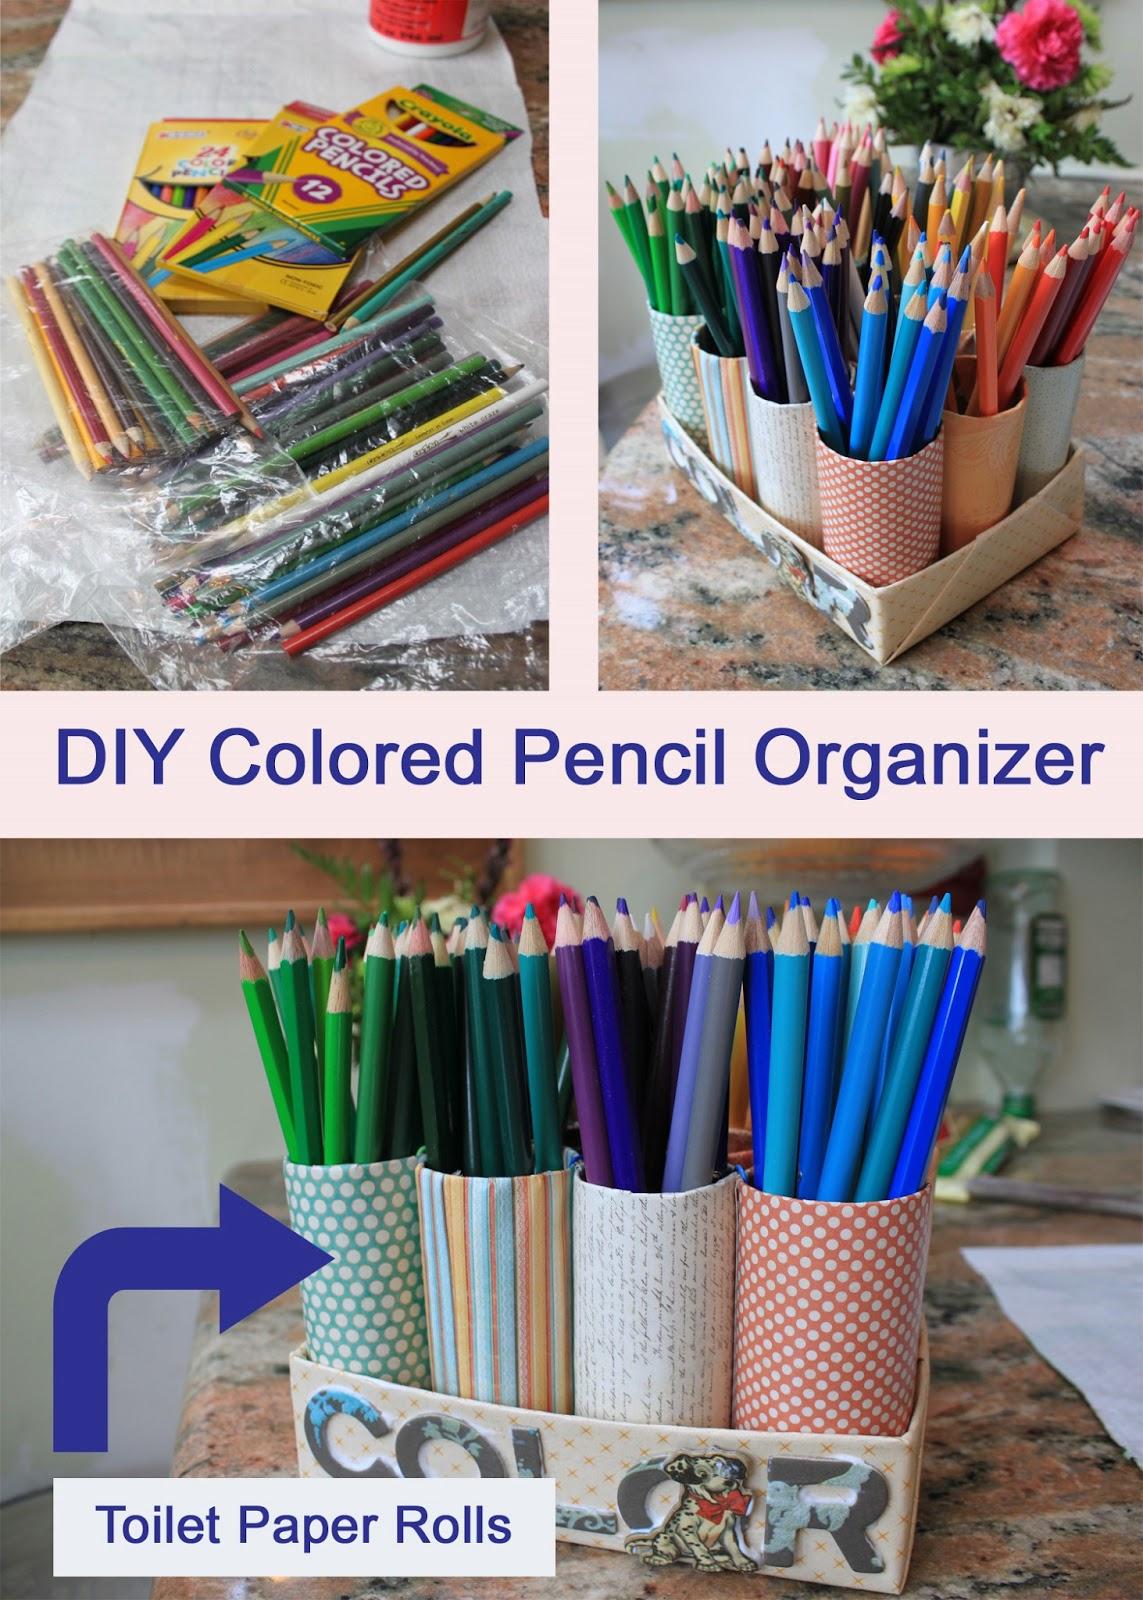 My Great Challenge Diy Colored Pencil Organizer